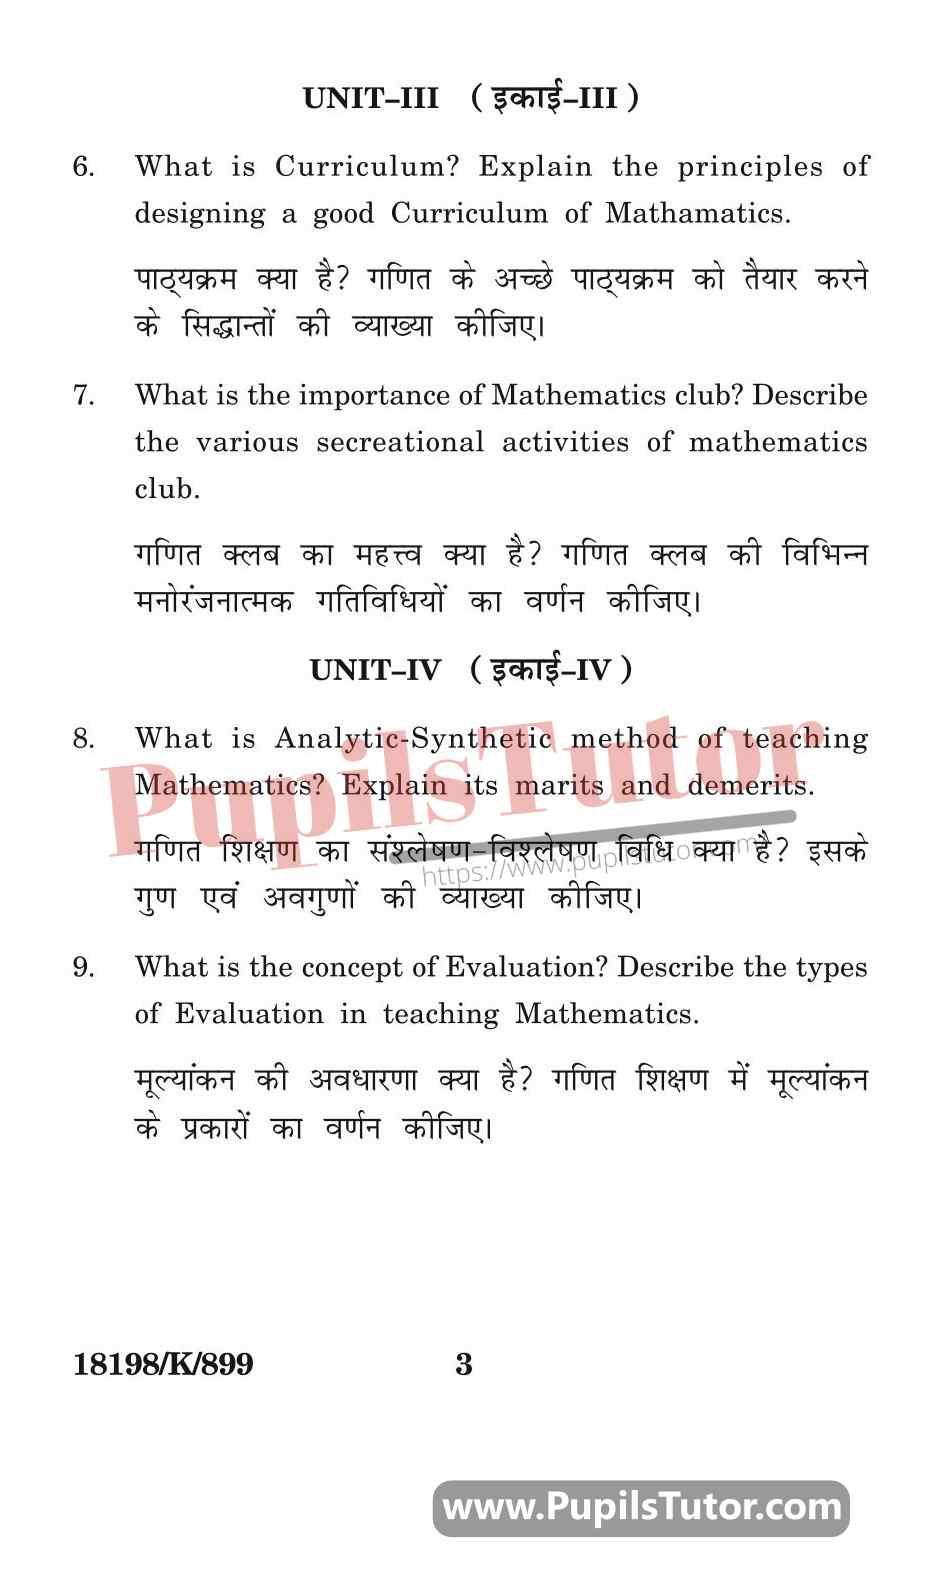 KUK (Kurukshetra University, Haryana) Pedagogy Of Maths Question Paper 2020 For B.Ed 1st And 2nd Year And All The 4 Semesters In English And Hindi Medium Free Download PDF